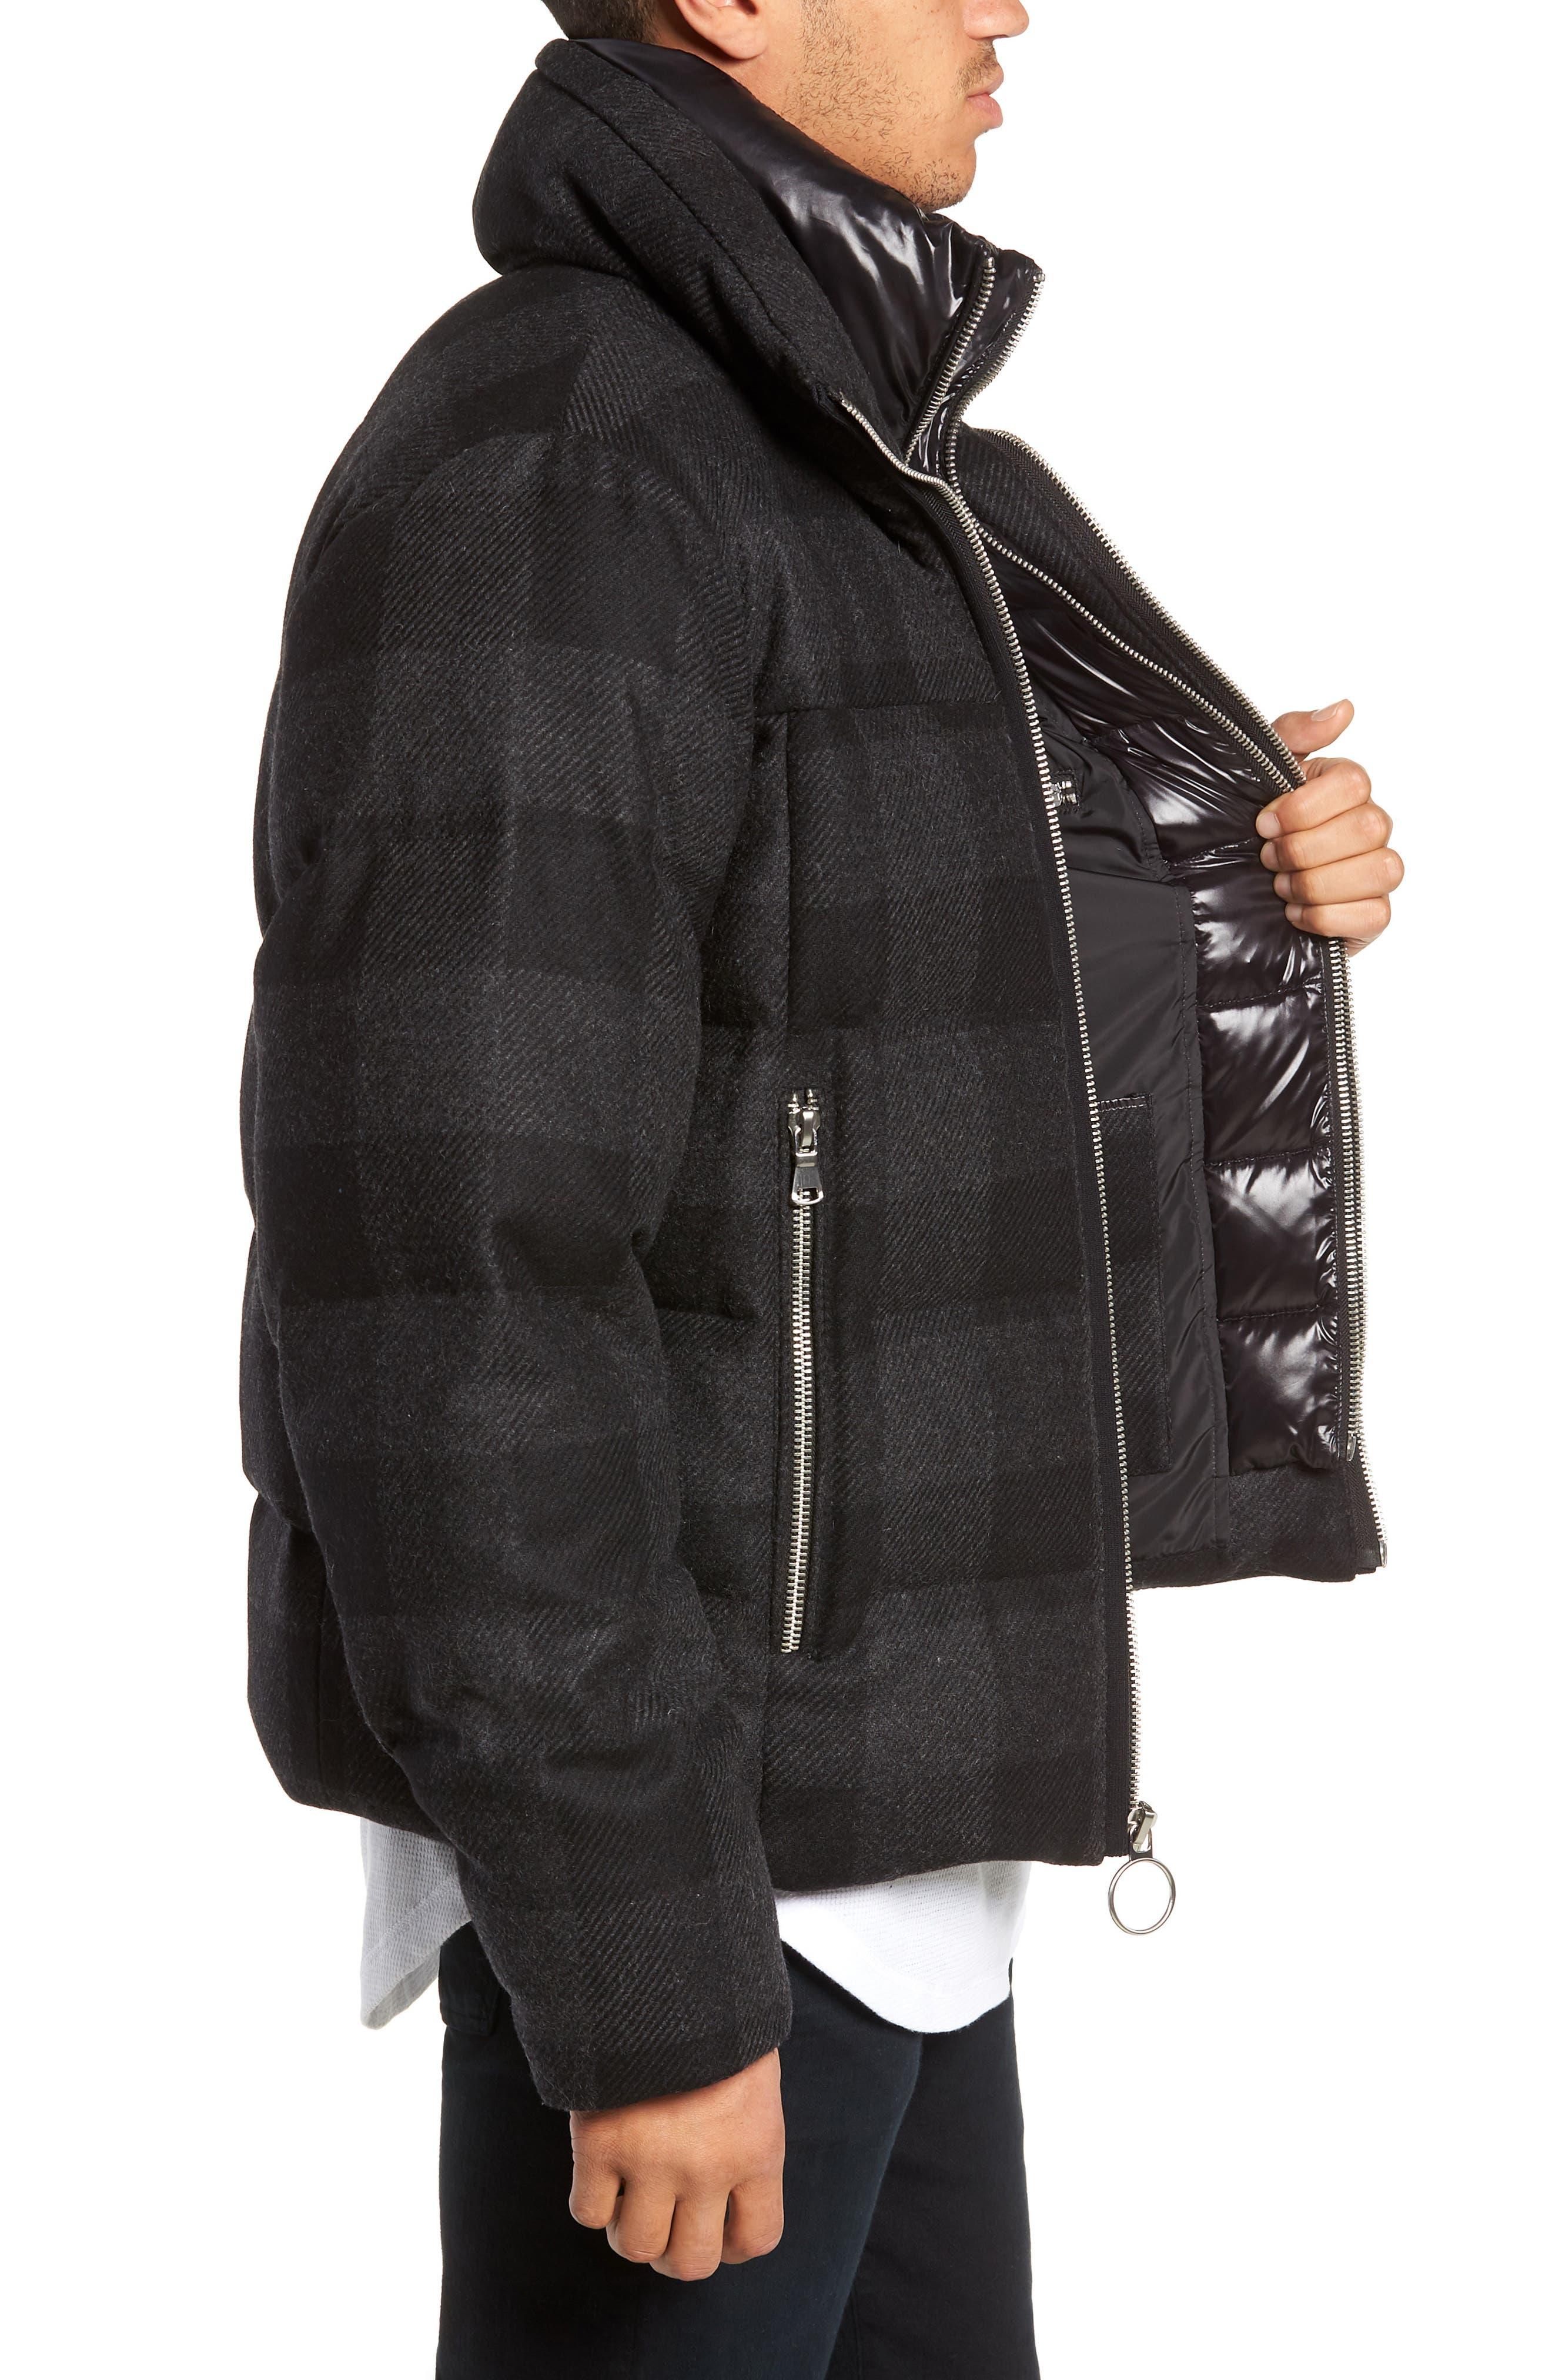 Crosby Plaid Wool Bib Puffer Jacket,                             Alternate thumbnail 3, color,                             CHARCOAL/ BLACK PLAID